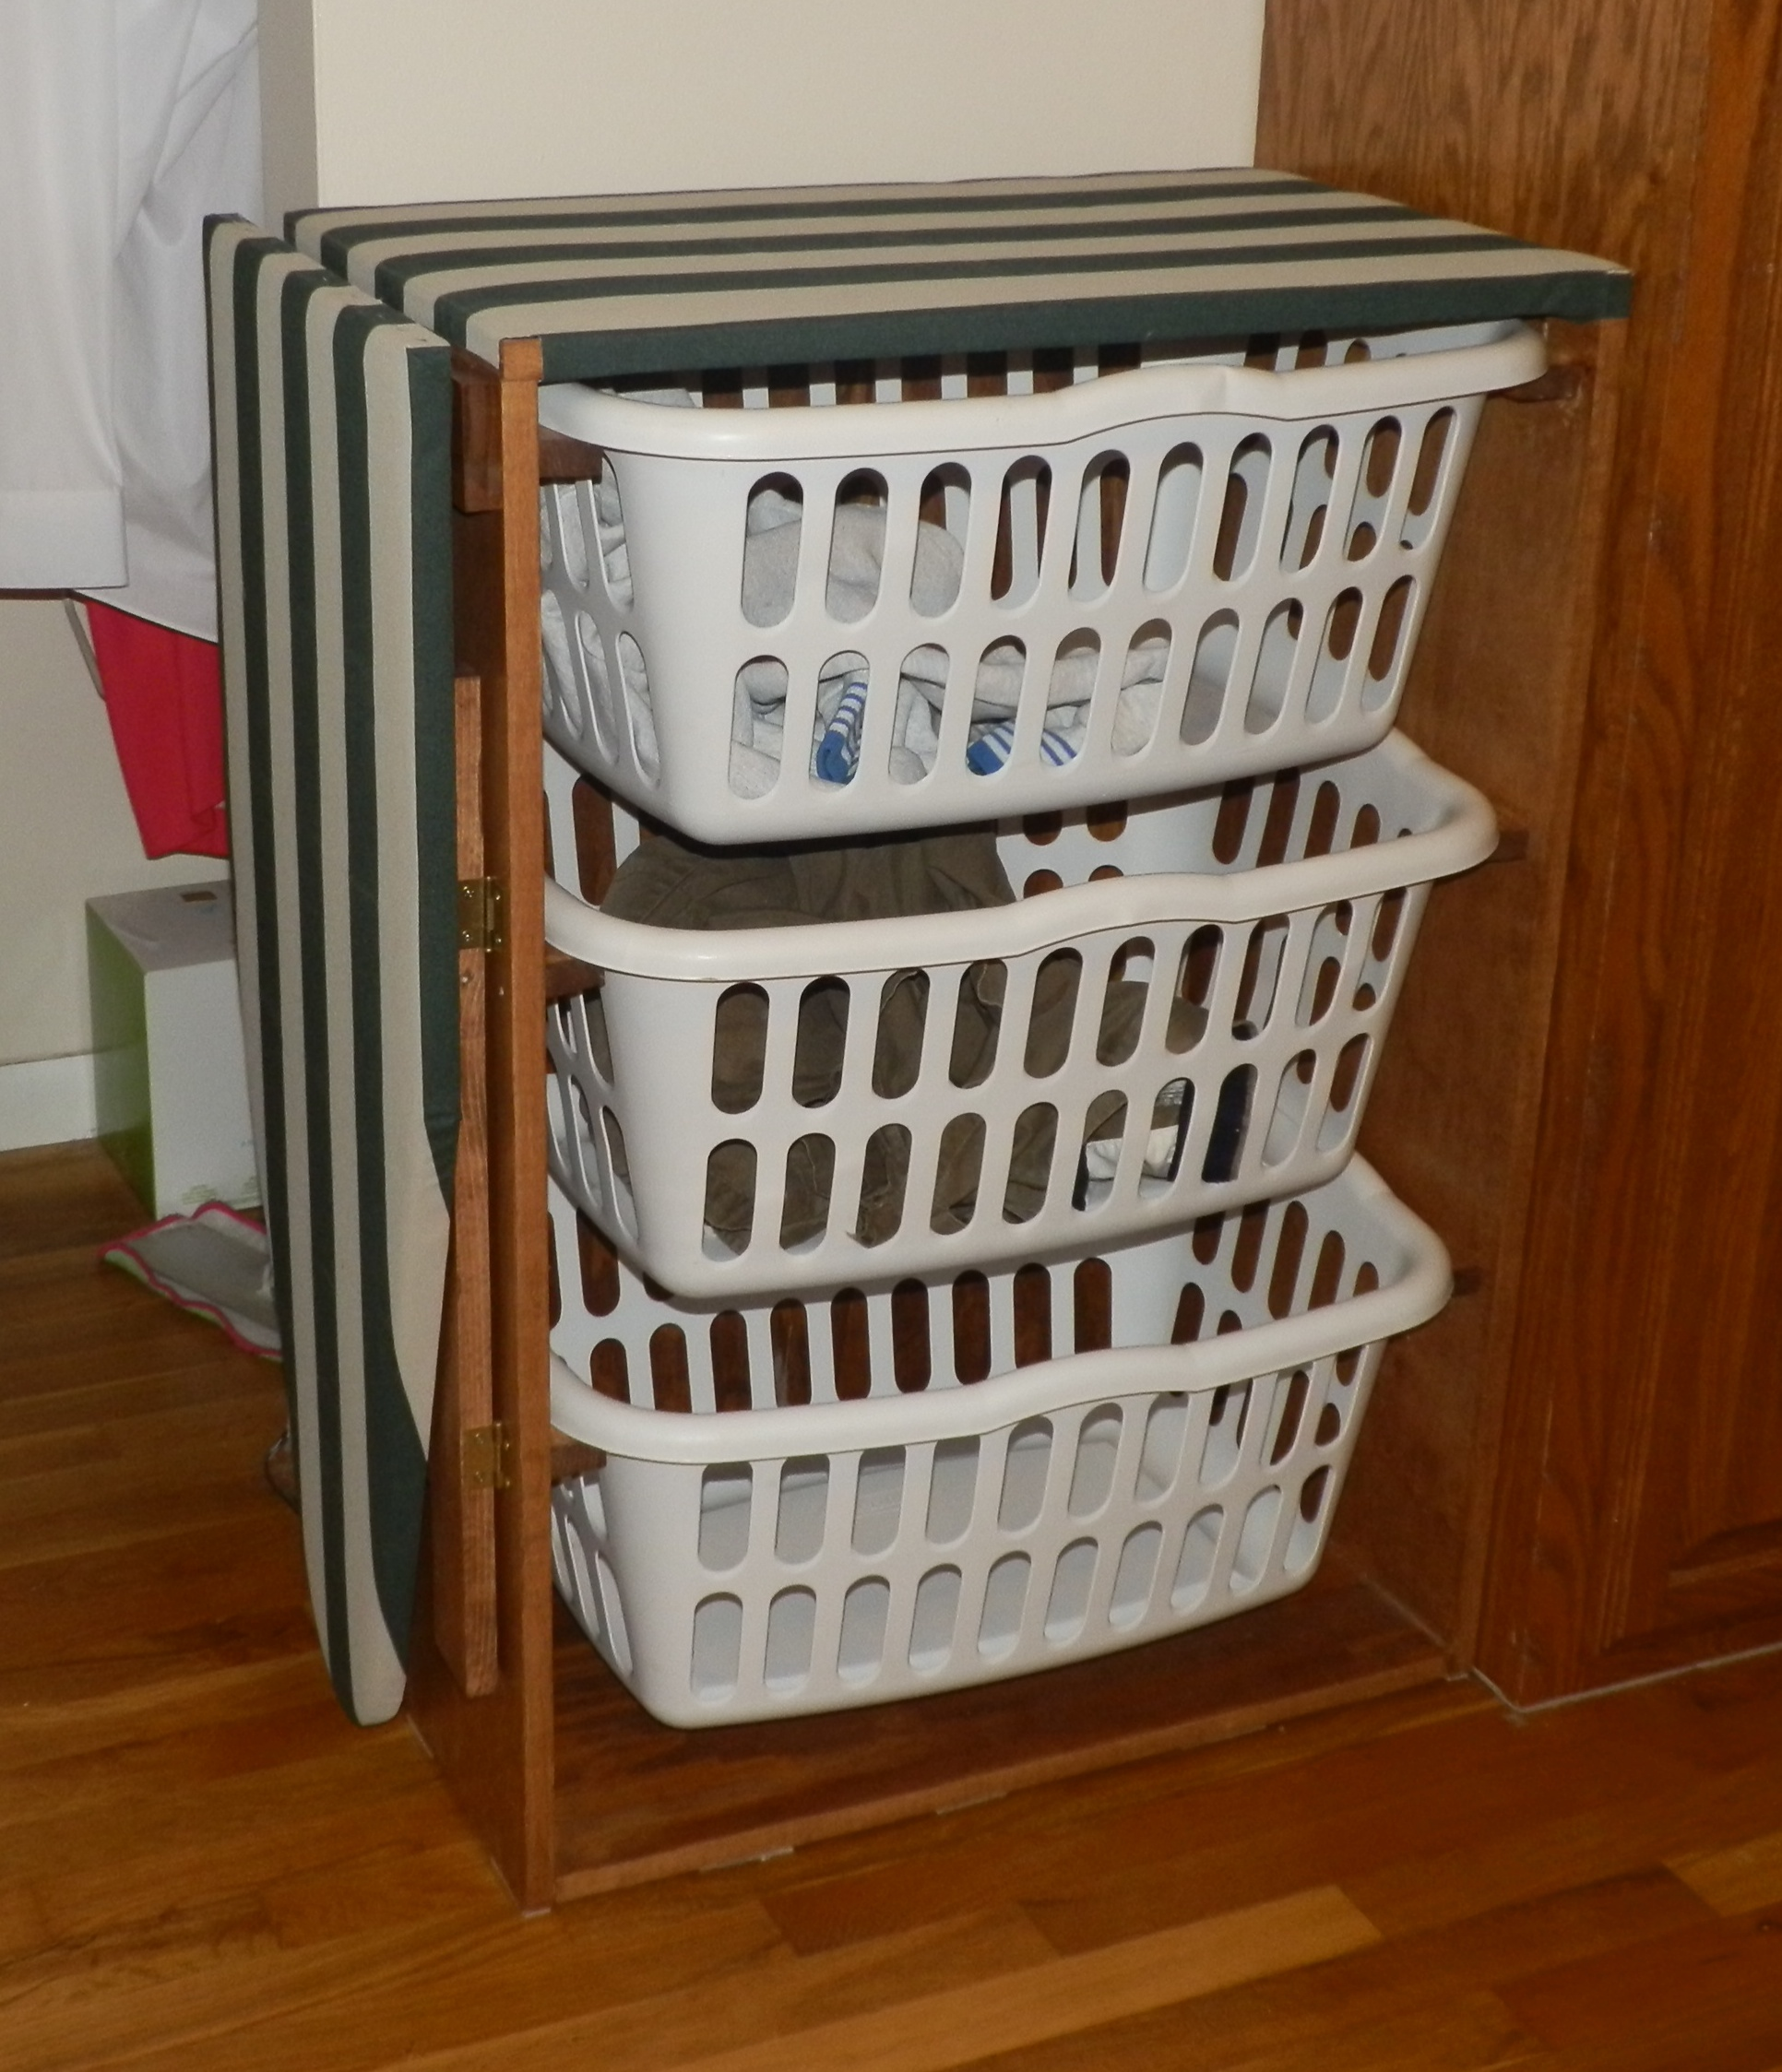 laundry drop down ironing board | Laundry basket dresser with a drop-down ironing board ...